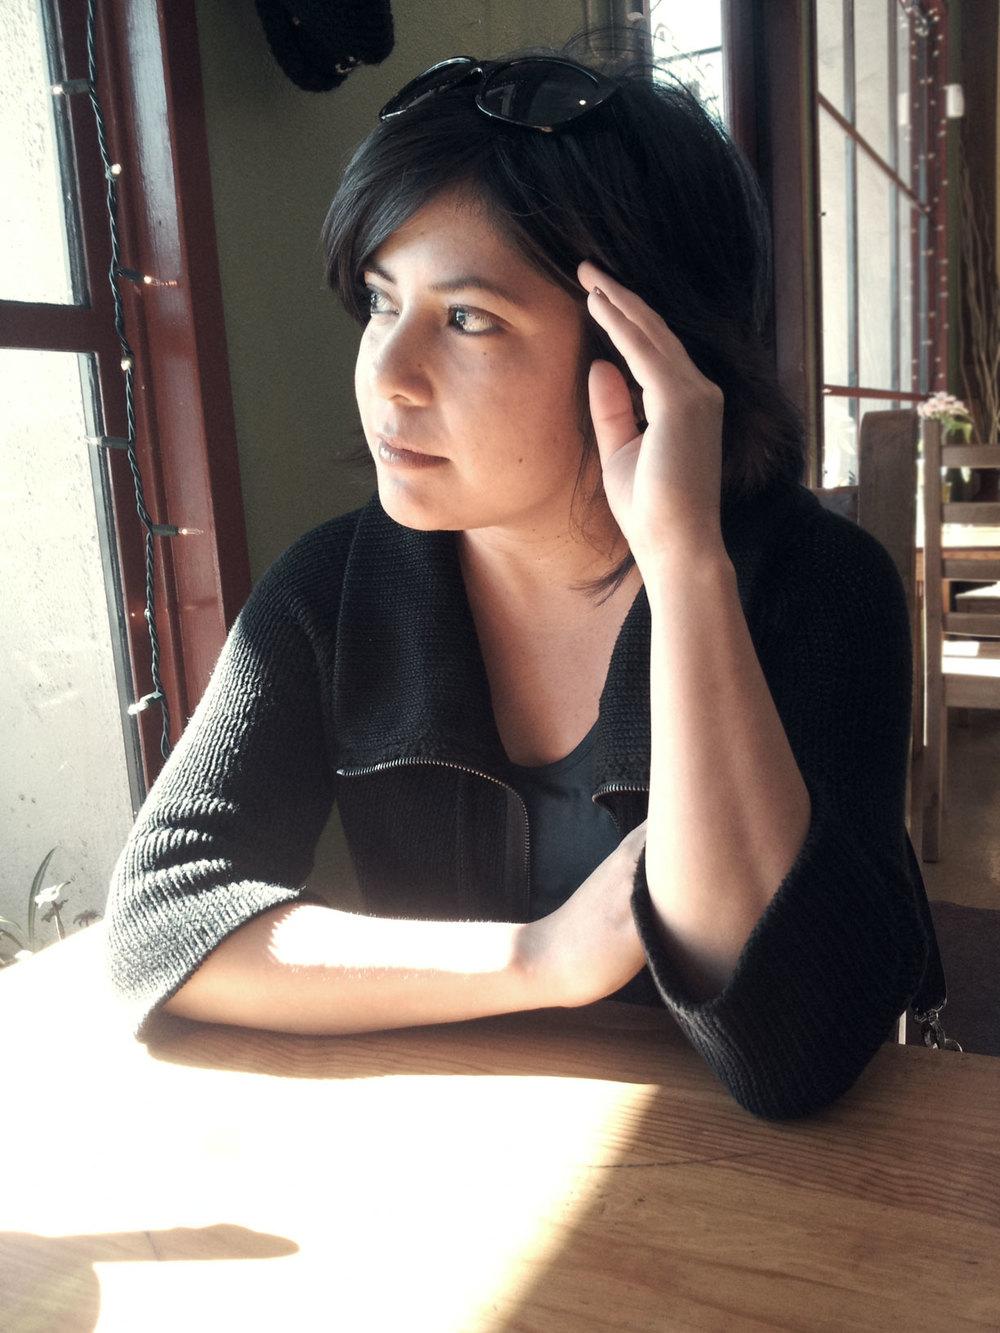 Laura_SantaBarbara.jpg